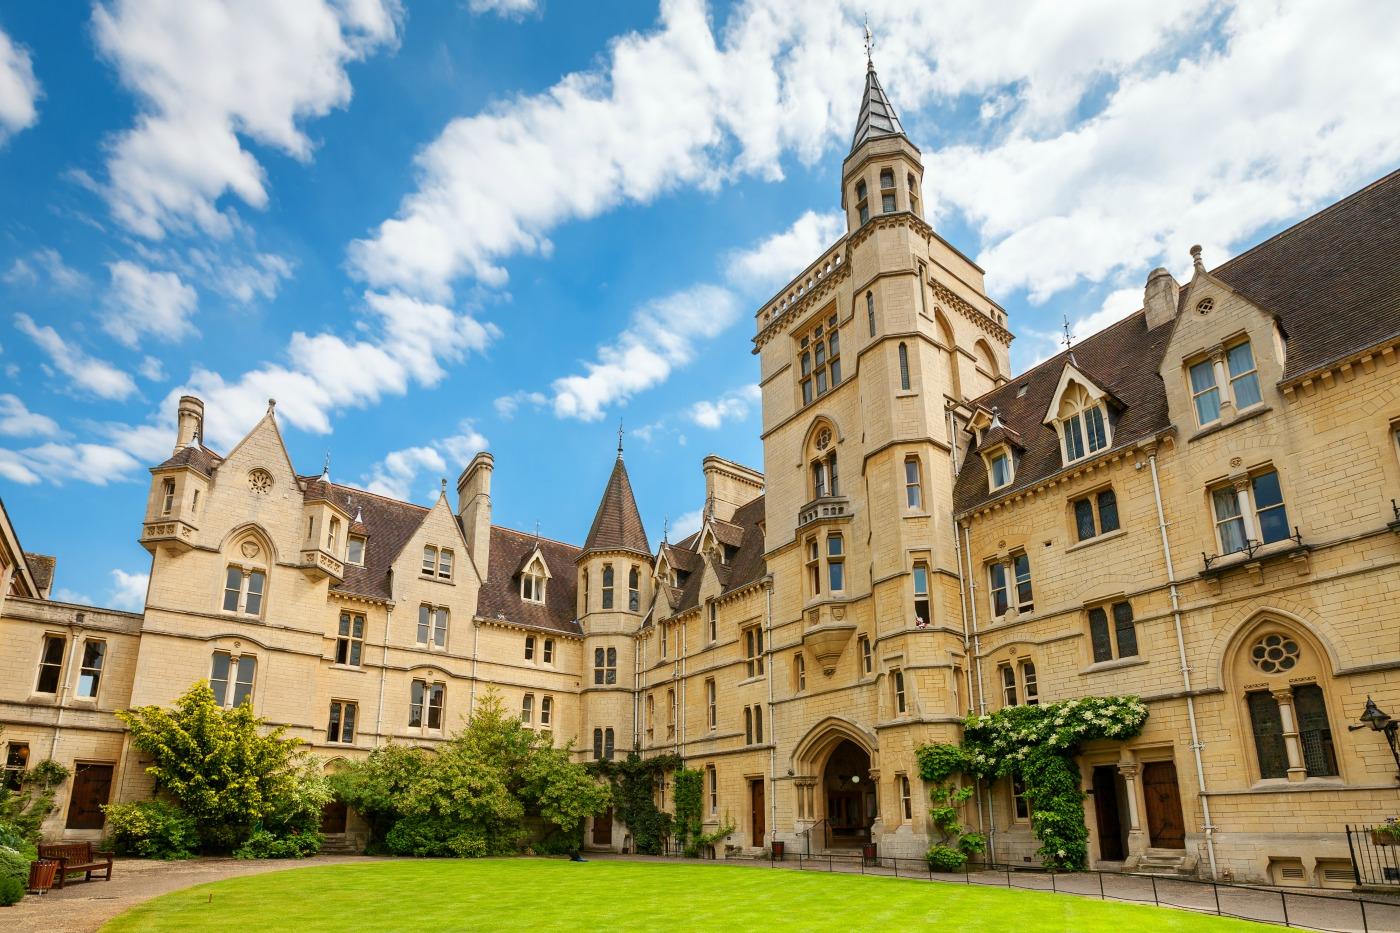 8aee8175dbf5 bigstock-Balliol-College-Oxford-Engla-80108990.jpg